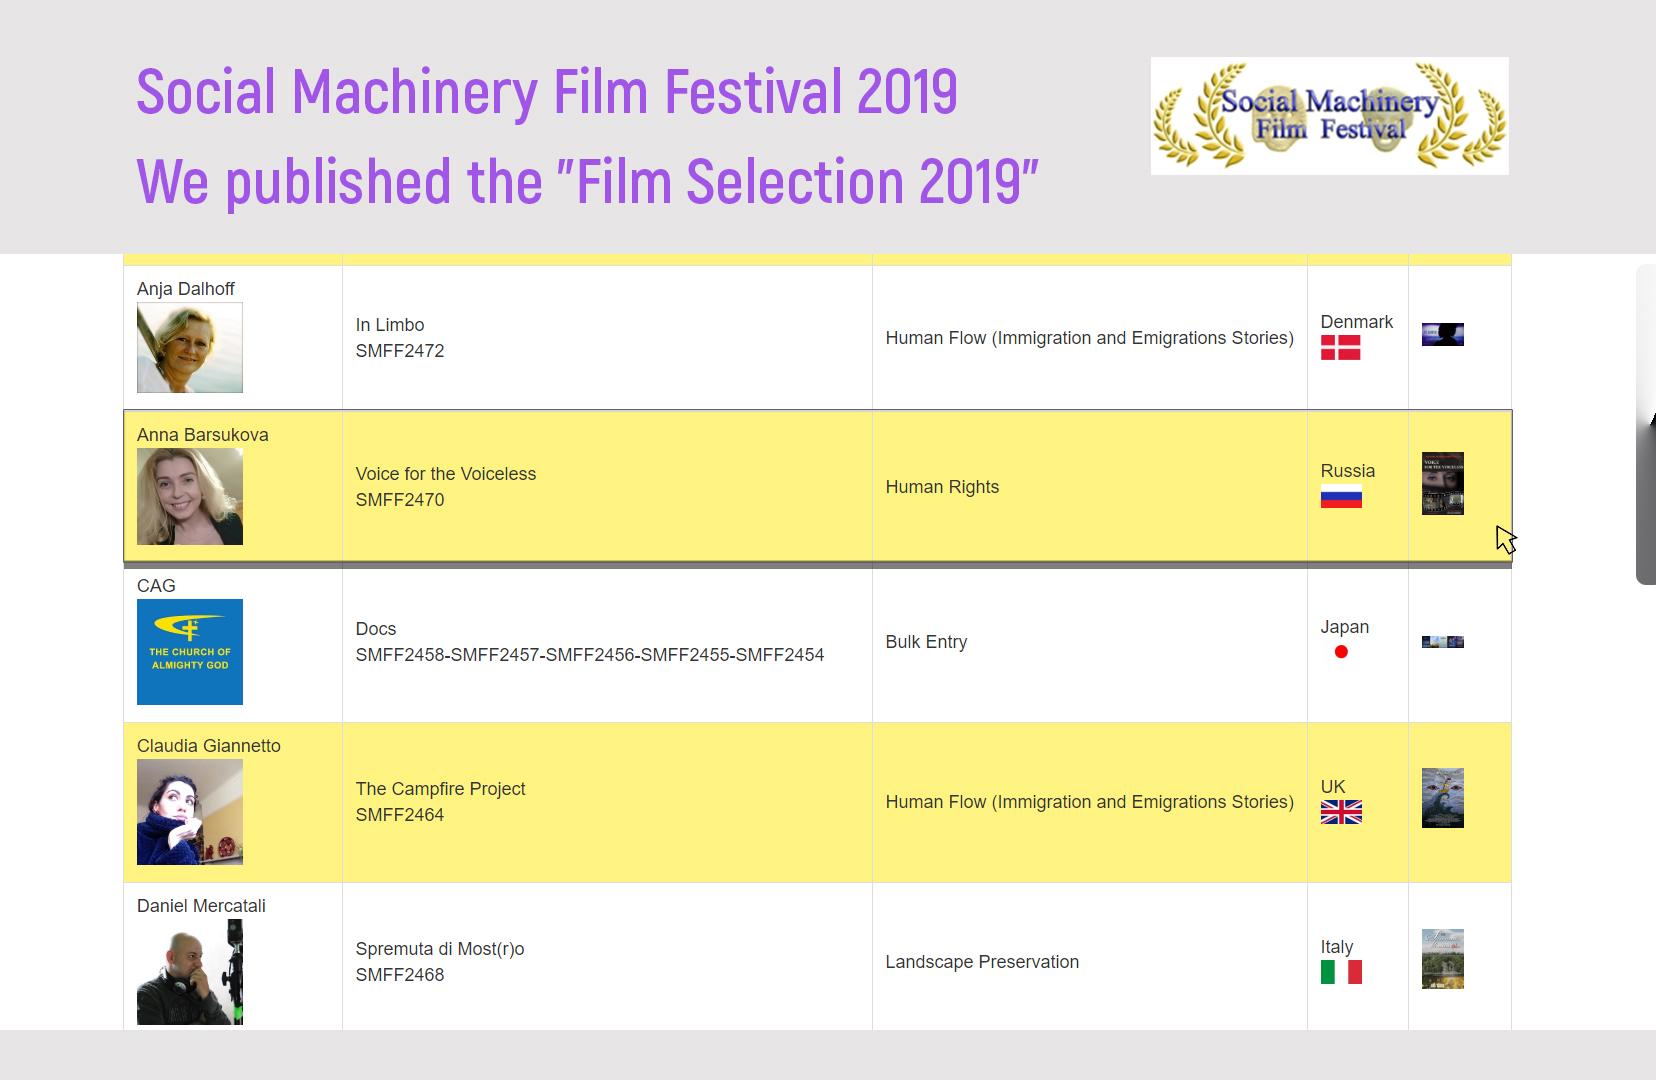 «Голос за безгласных» был представлен на фестивале «Social Machinery Film Festival» (Риццикони, Италия).